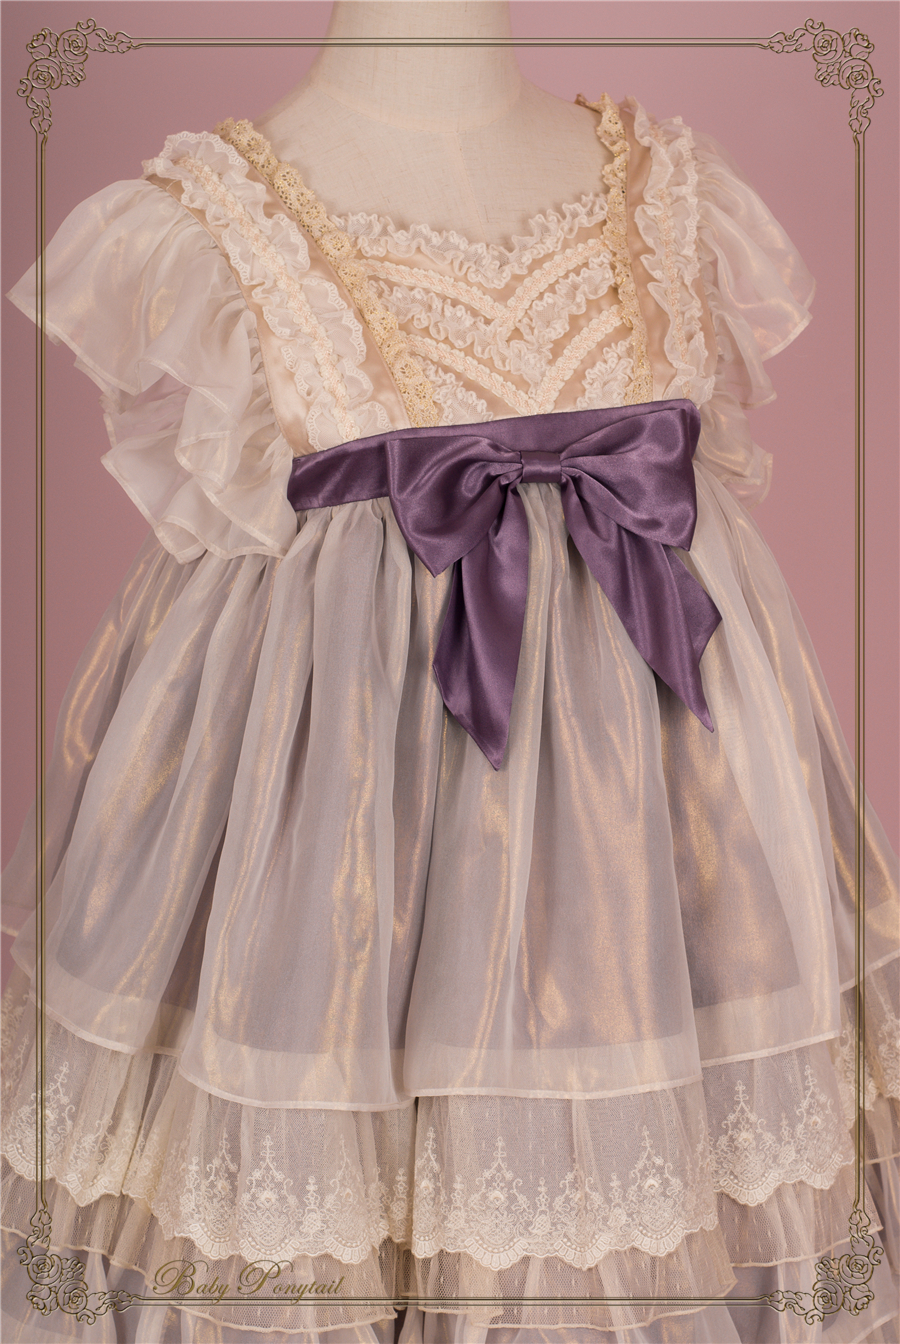 Babyponytail_Stock Photo_Present Angel_JSK Lavender_10.jpg